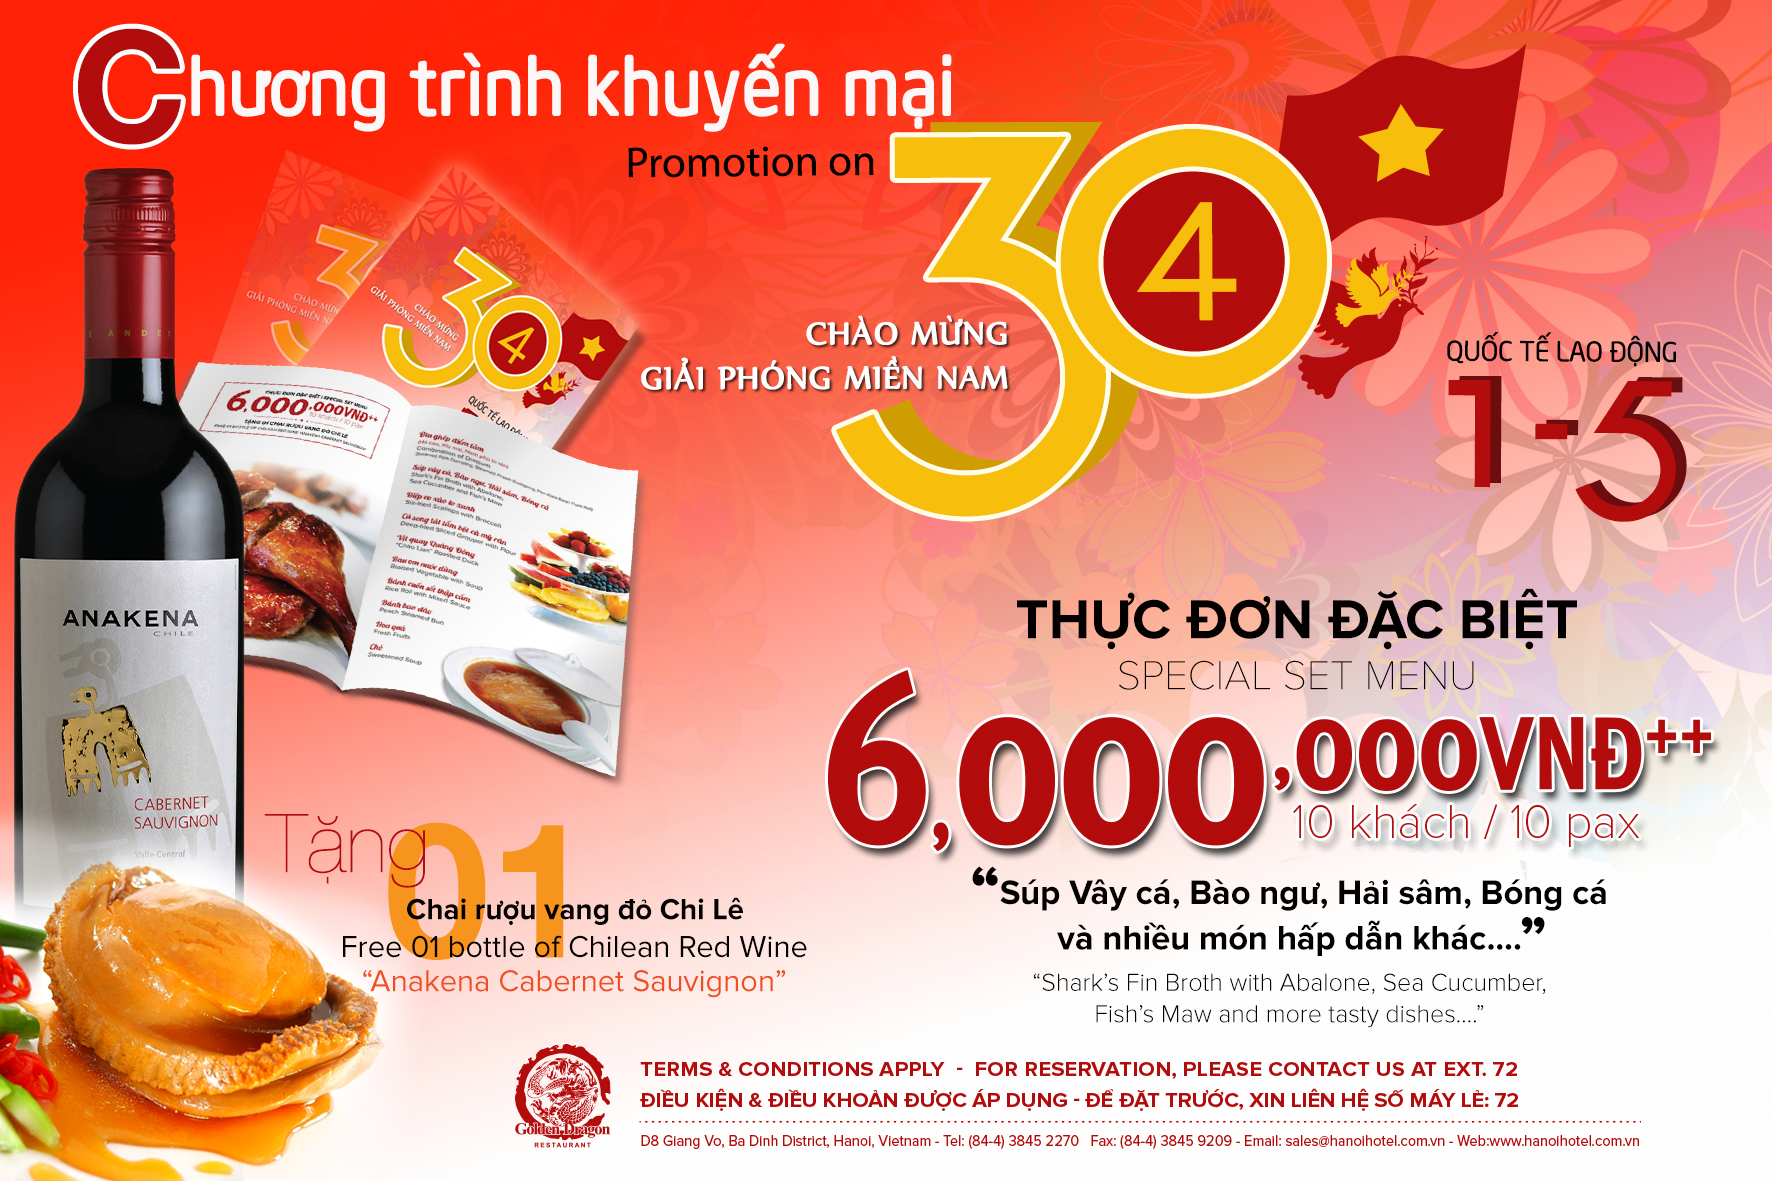 「Hanoi ホテル」南部解放記念日にプロモーションのお知らせ!